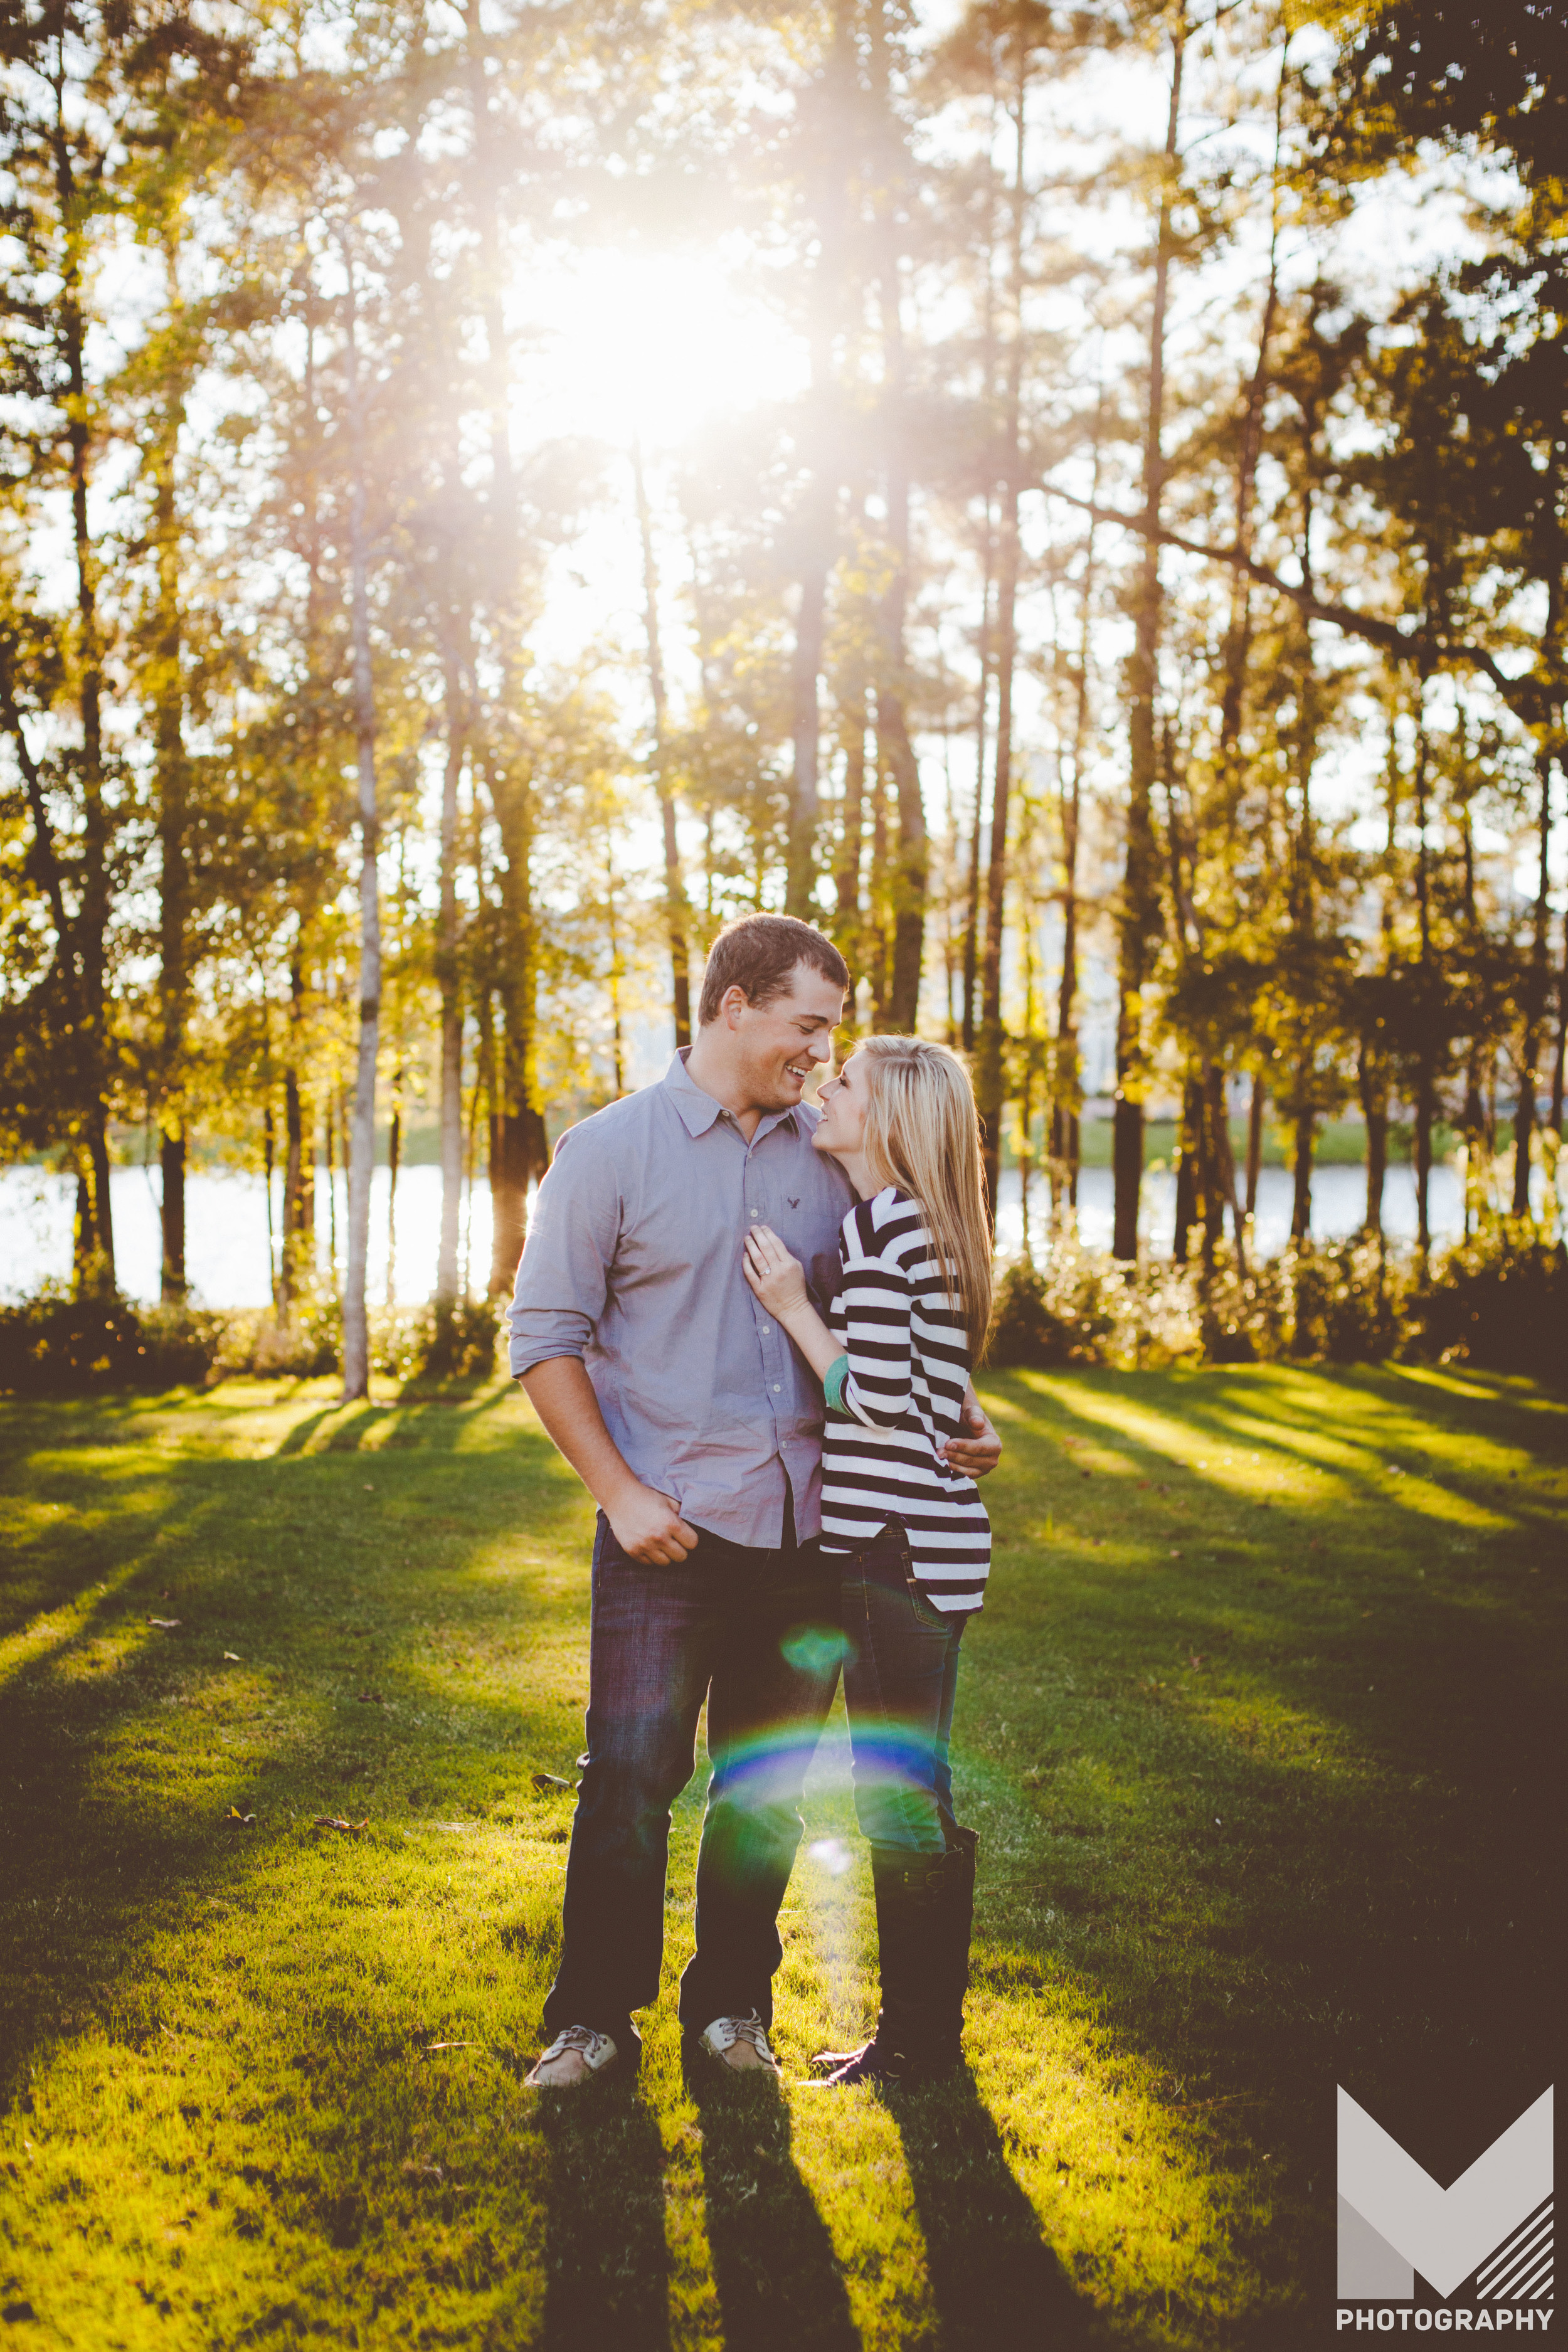 Jainelle and Daniel-22.jpg